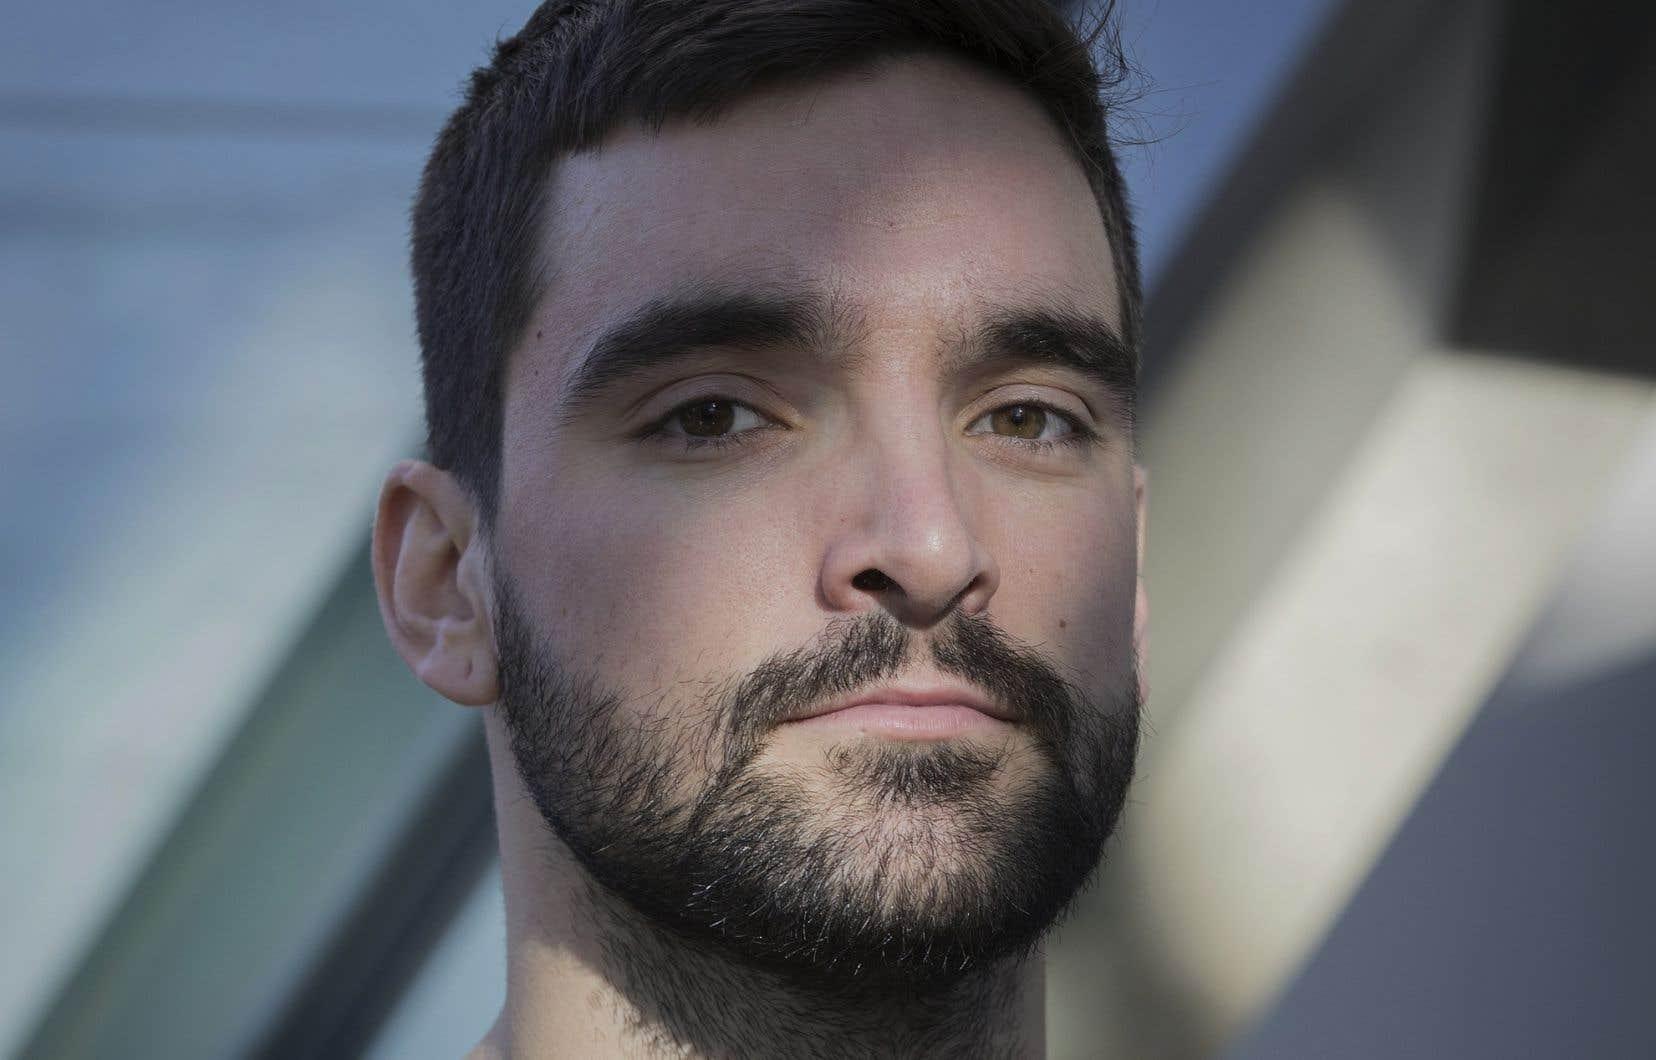 L'auteurJean-Philippe Baril Guérard